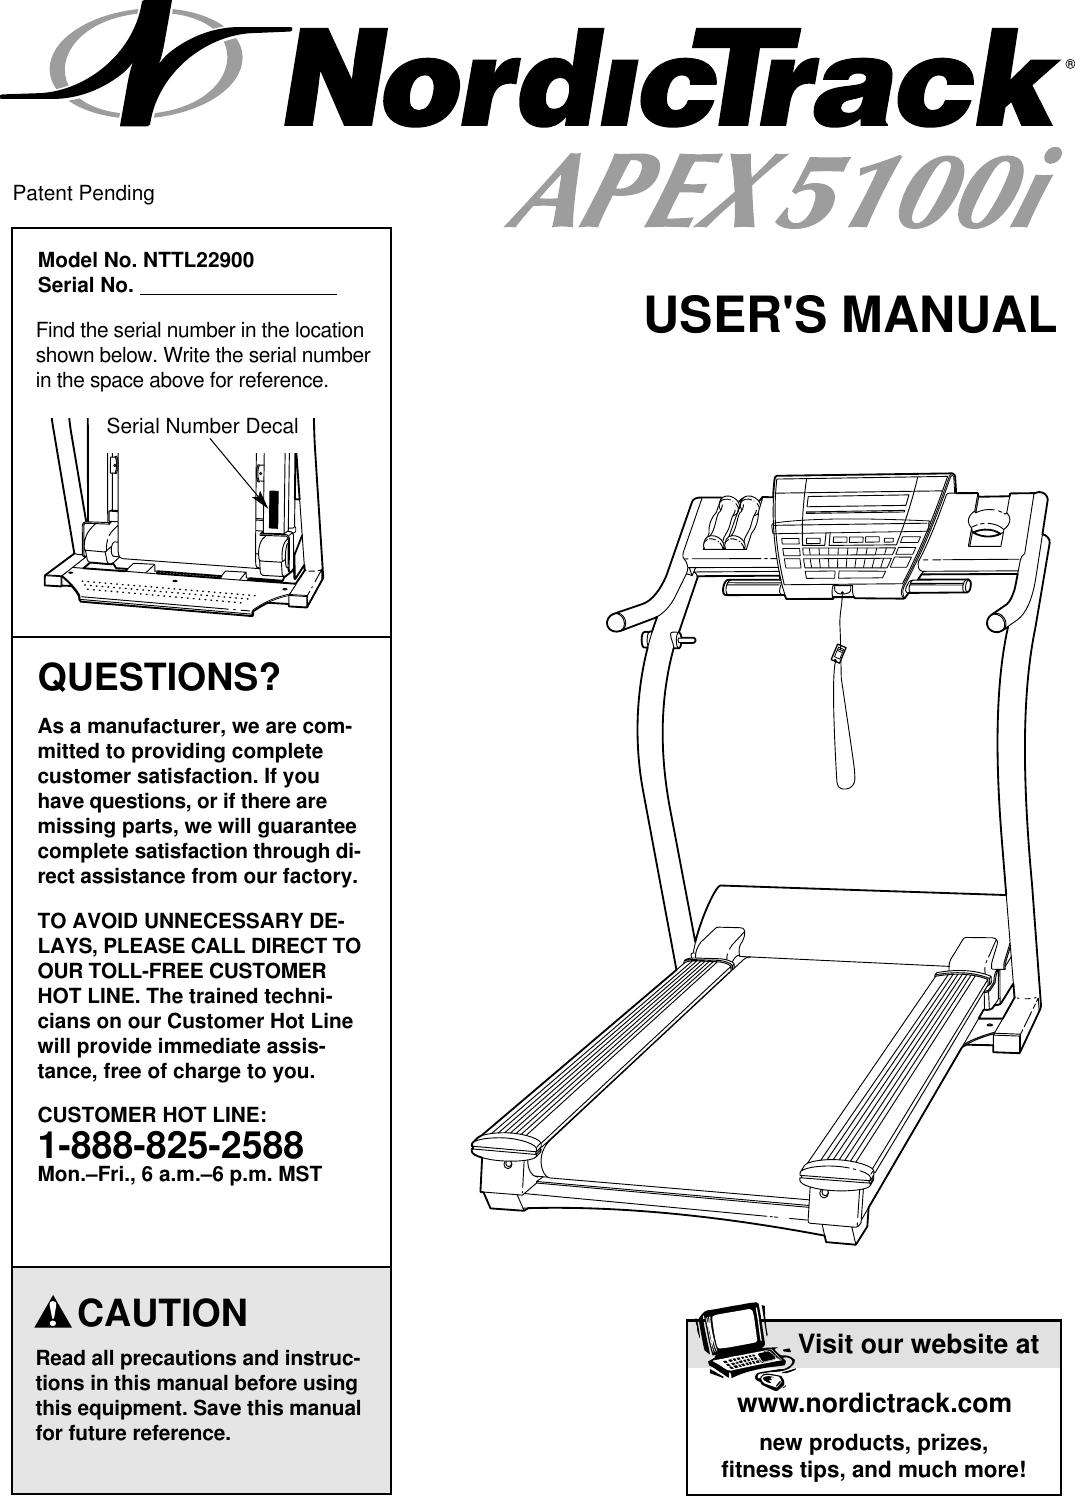 Atla Track Wiring Manual Guide